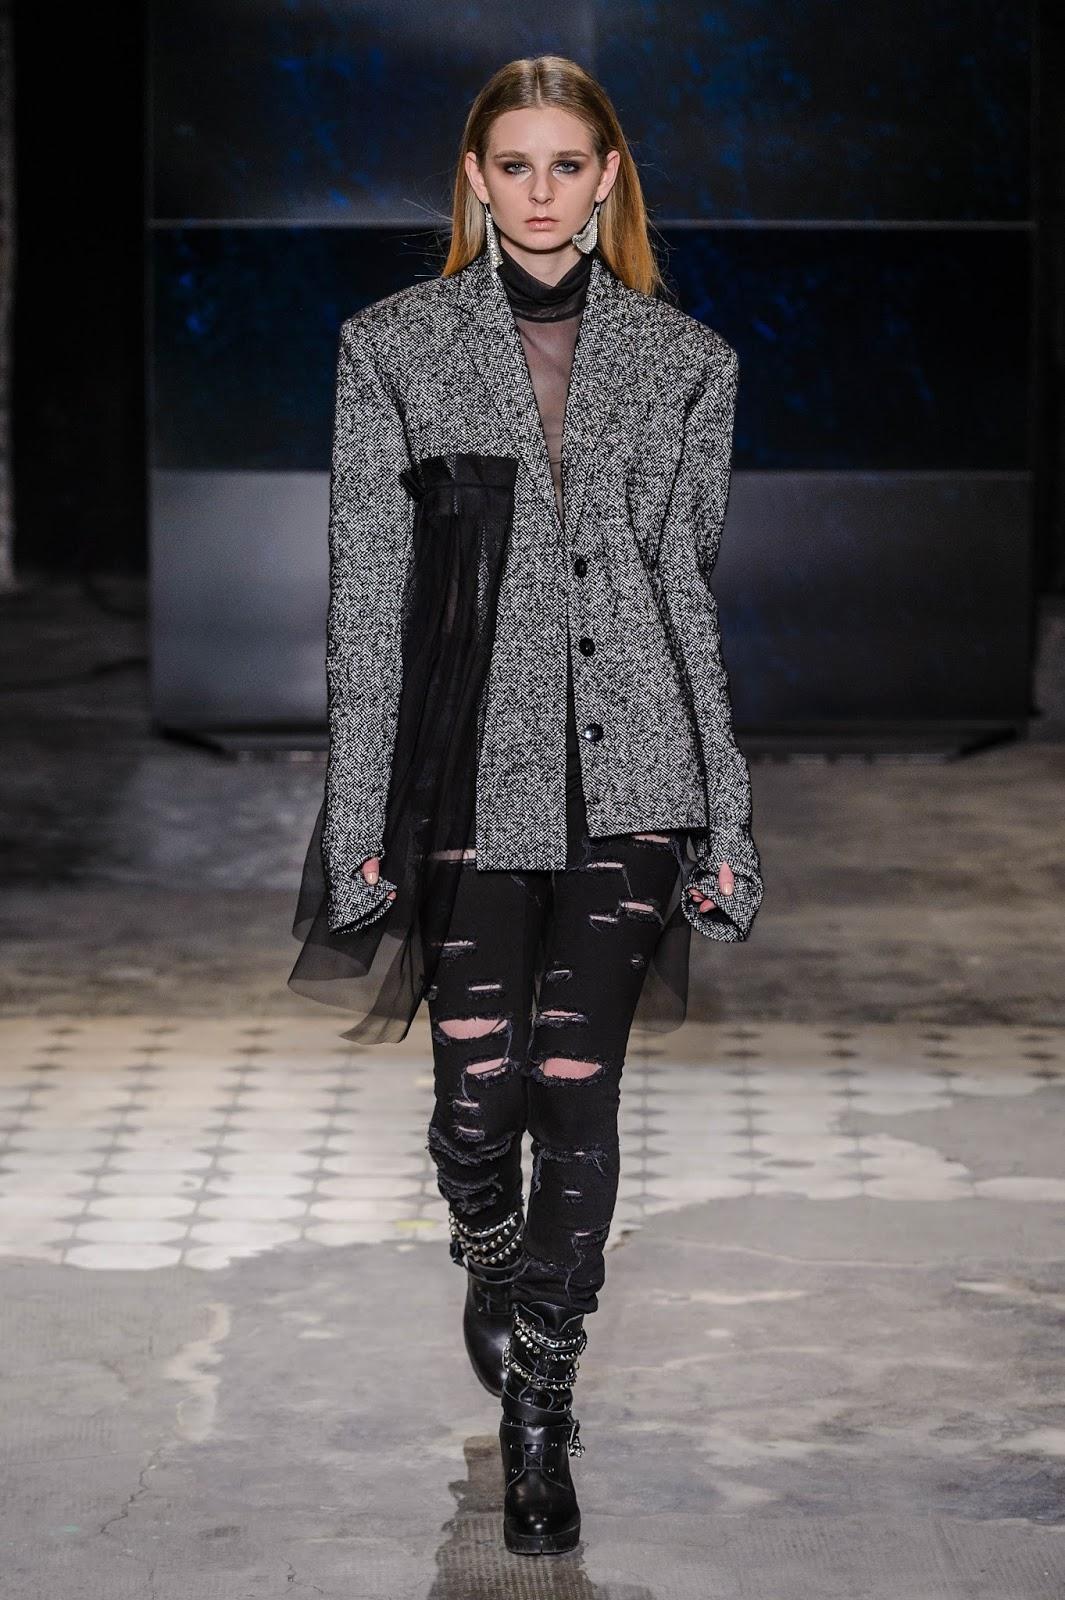 _KTW-LIDIA_KALITA-101117_highres_fotFilipOkopny-FashionImages